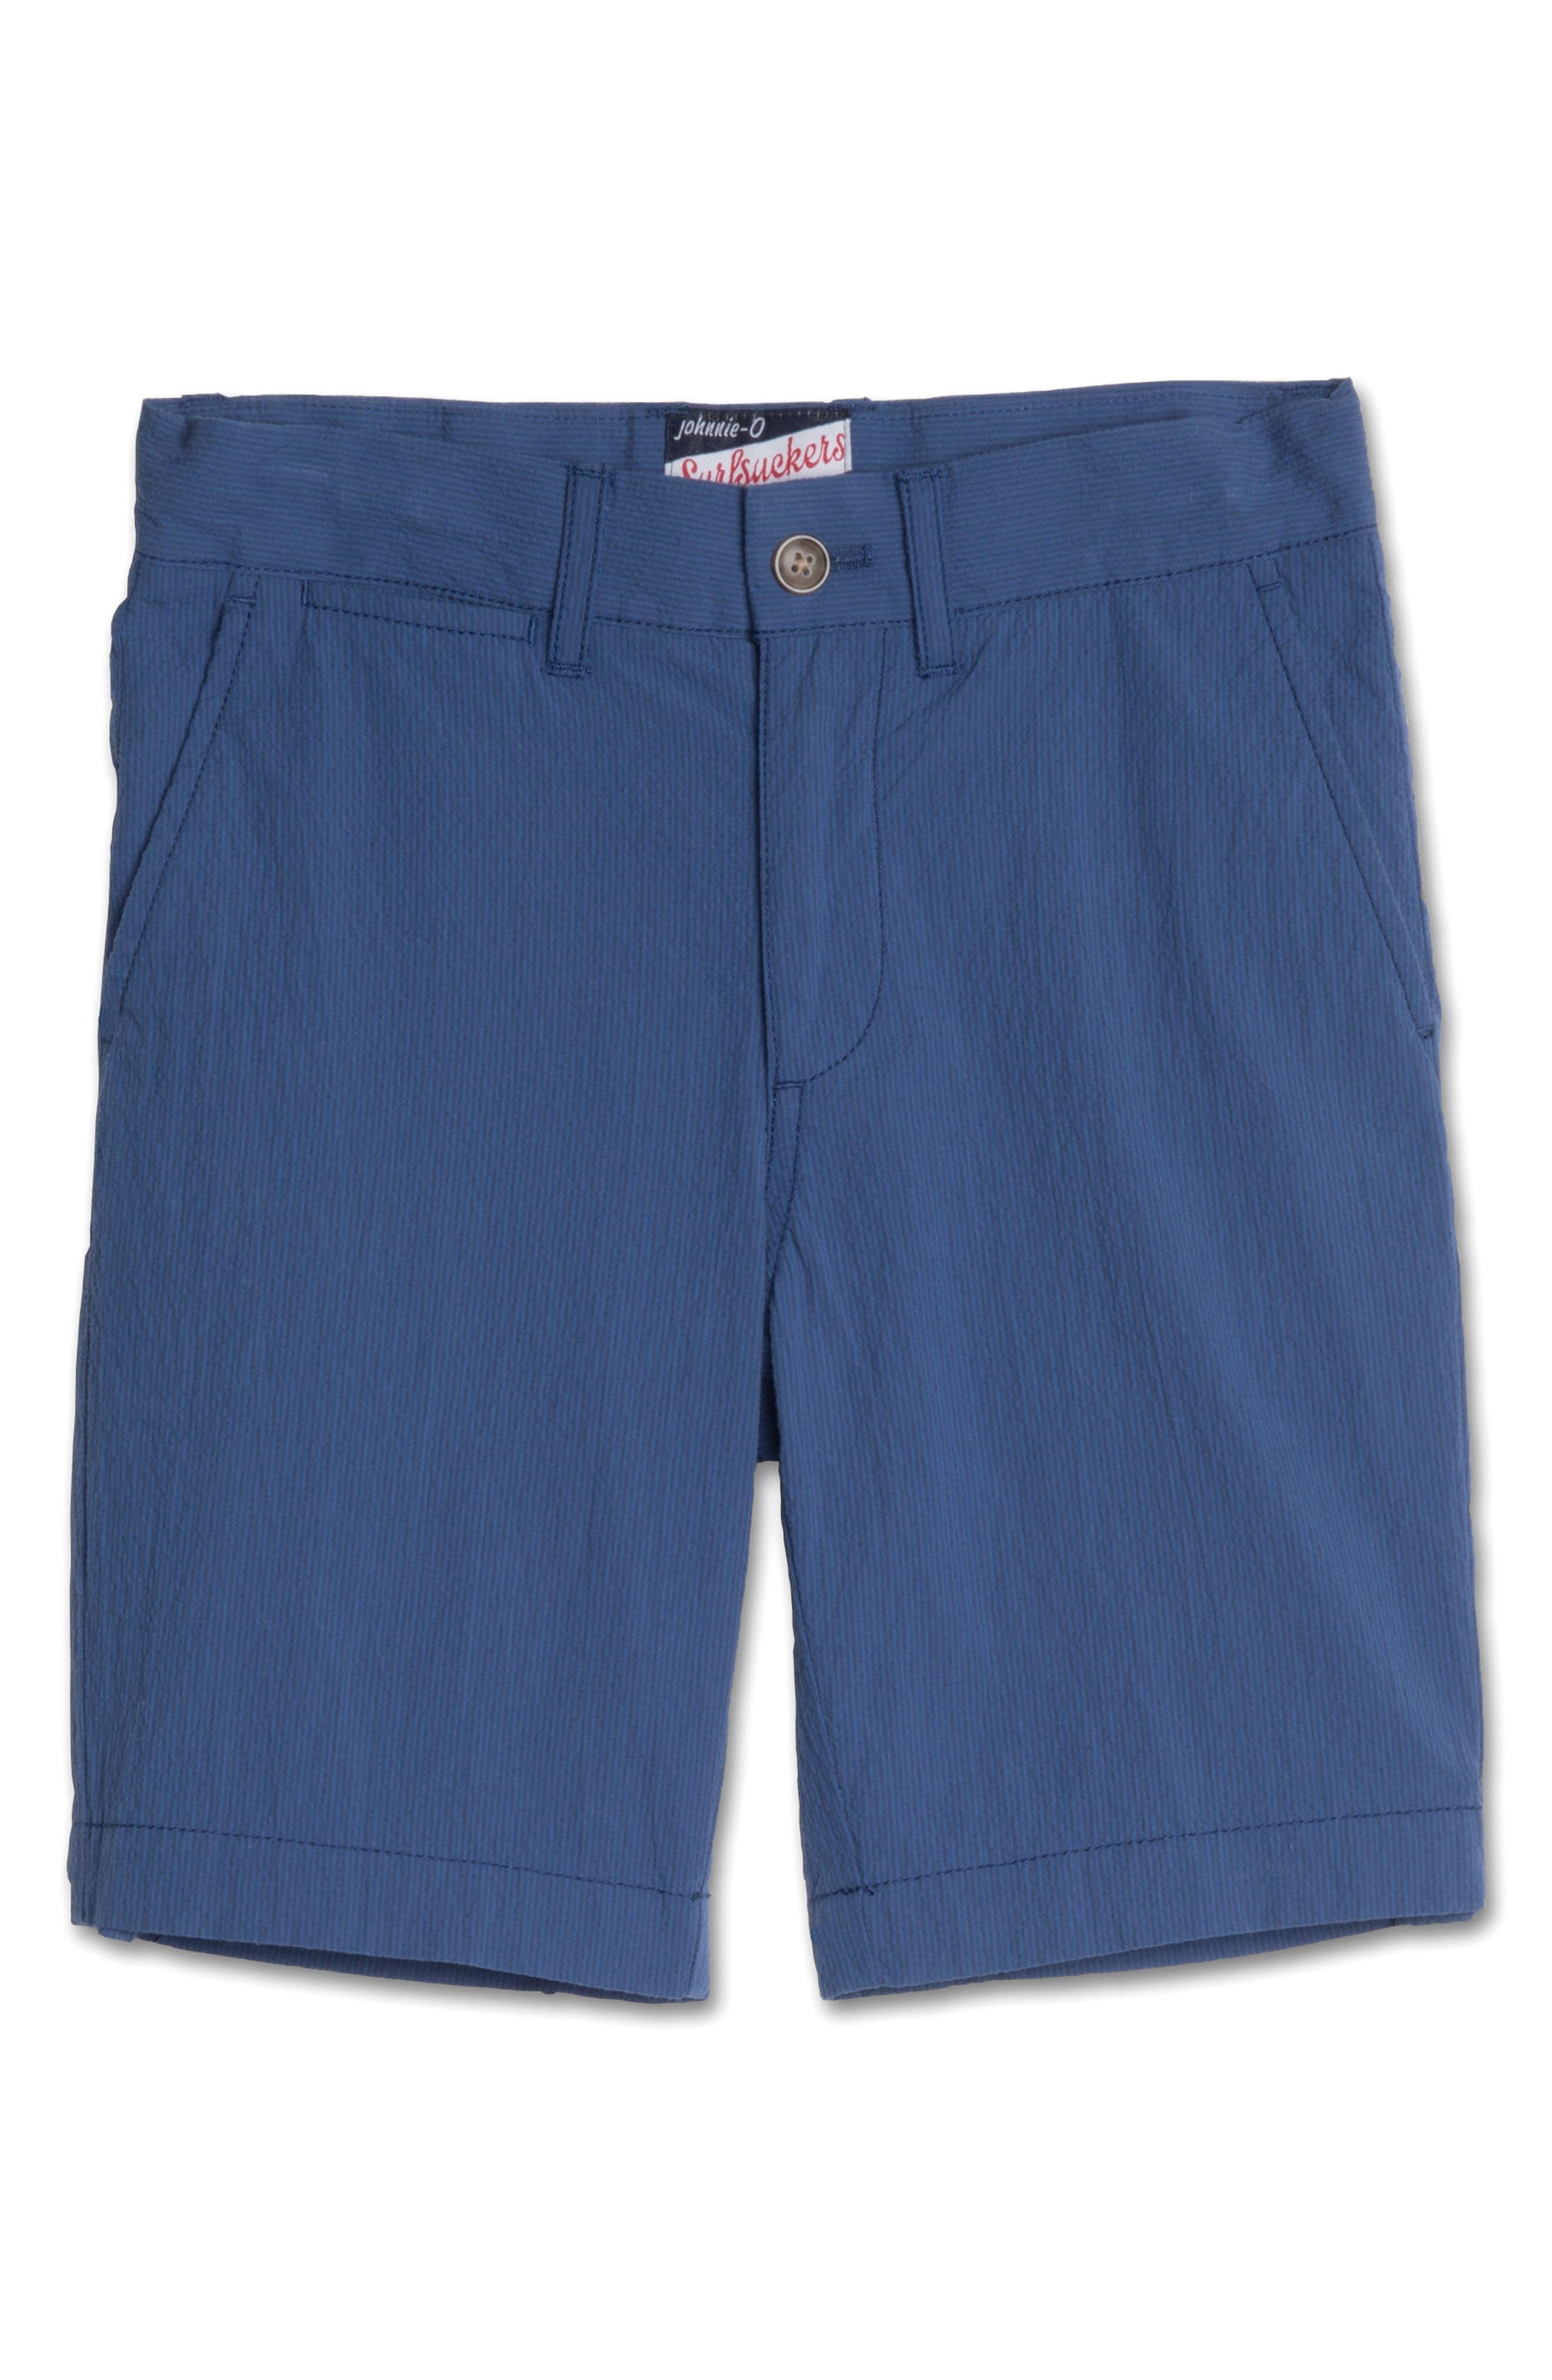 Bryson Seersucker Shorts,                         Main,                         color, Ripple